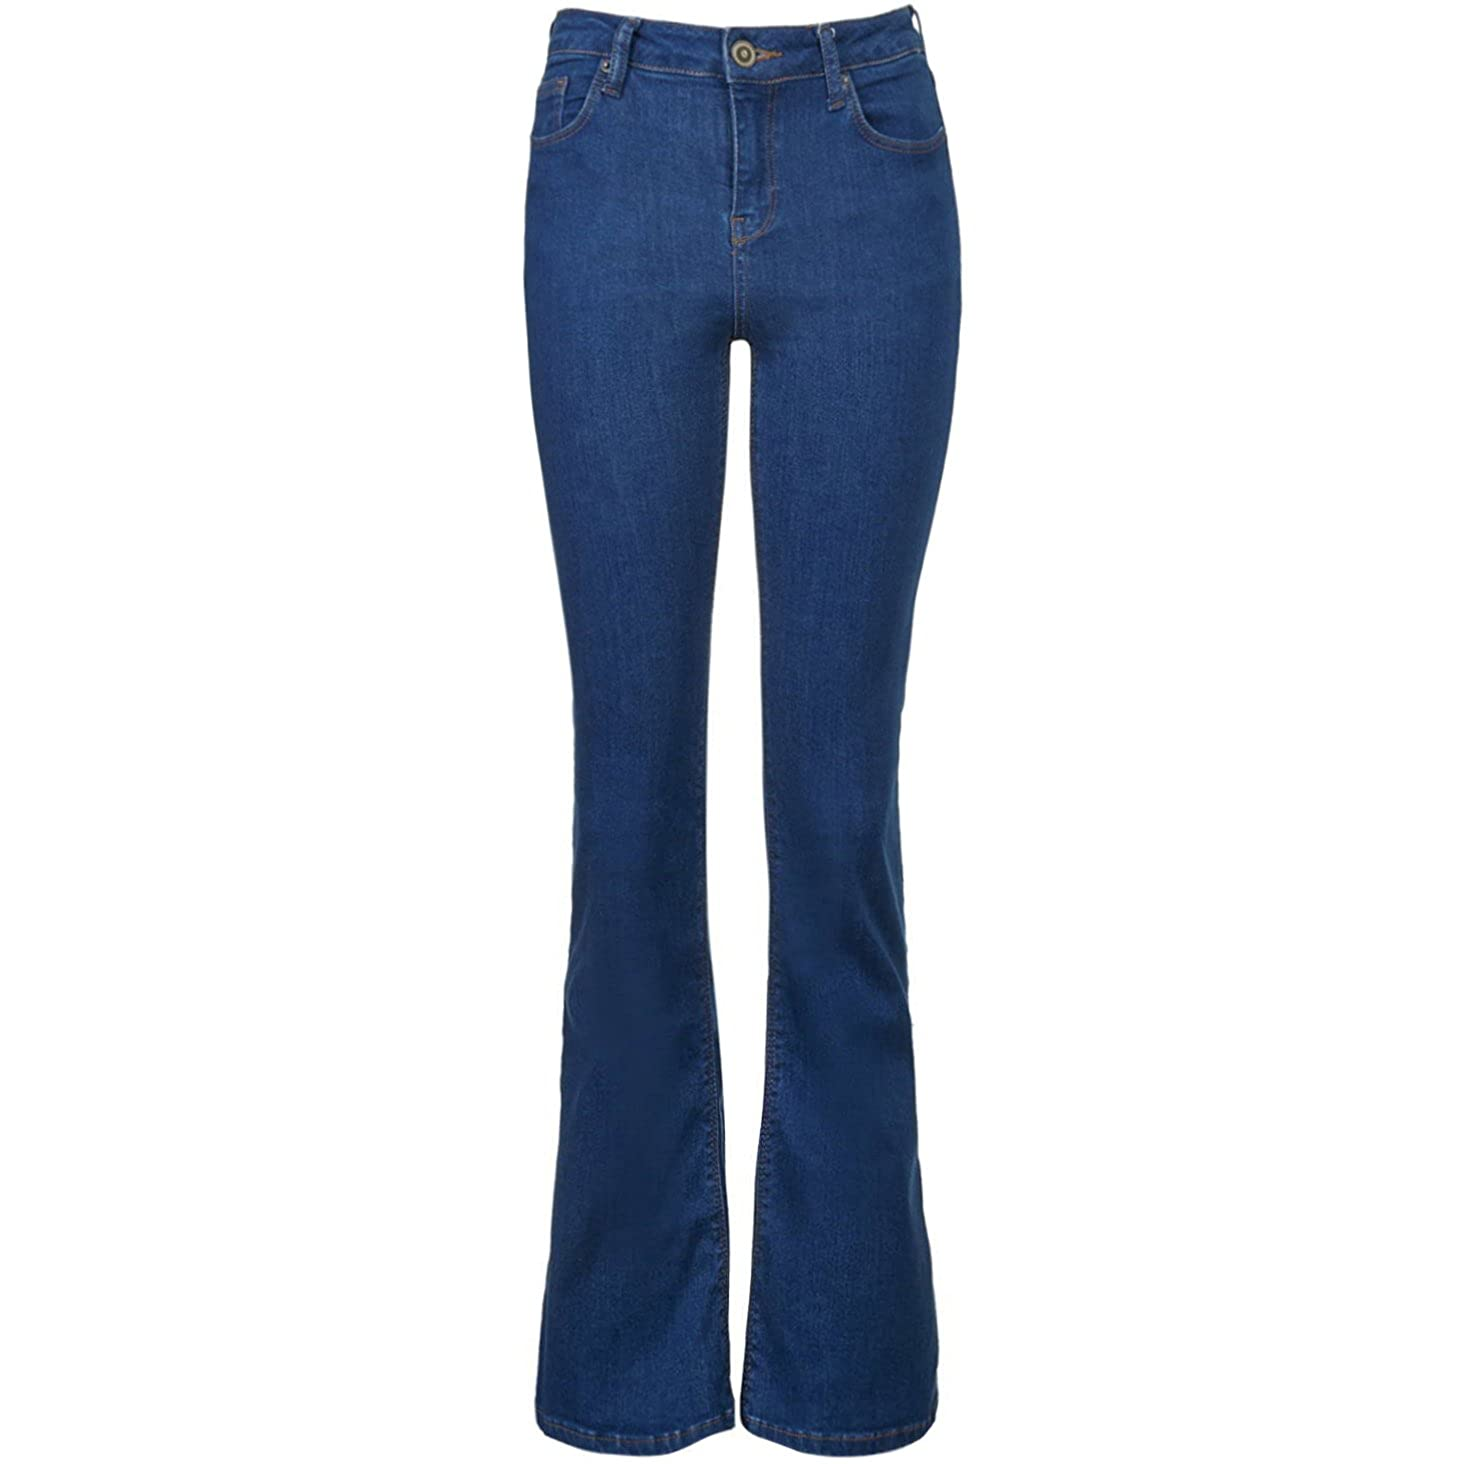 Bess New Ladies Flared Boot Cut Wide Leg Hipster Jeans Blue Black Stretch Denim UK 6-16 M-2202